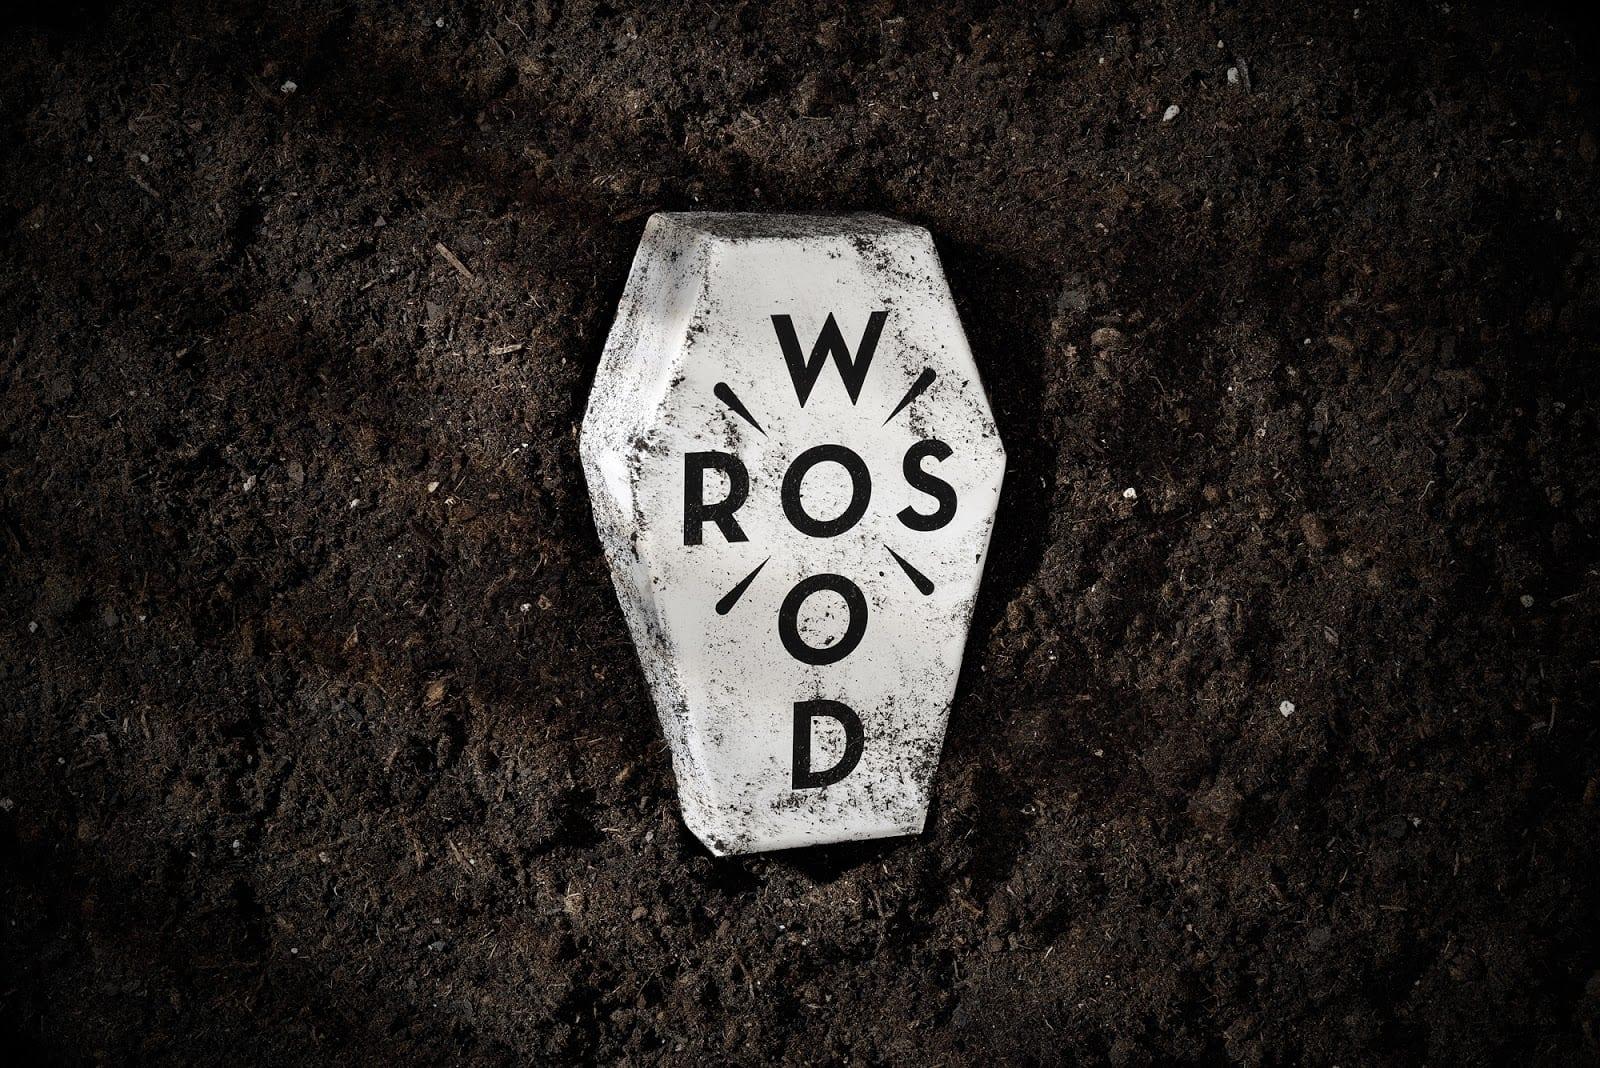 ataud 243 - Ach, tie obaly – Roswood